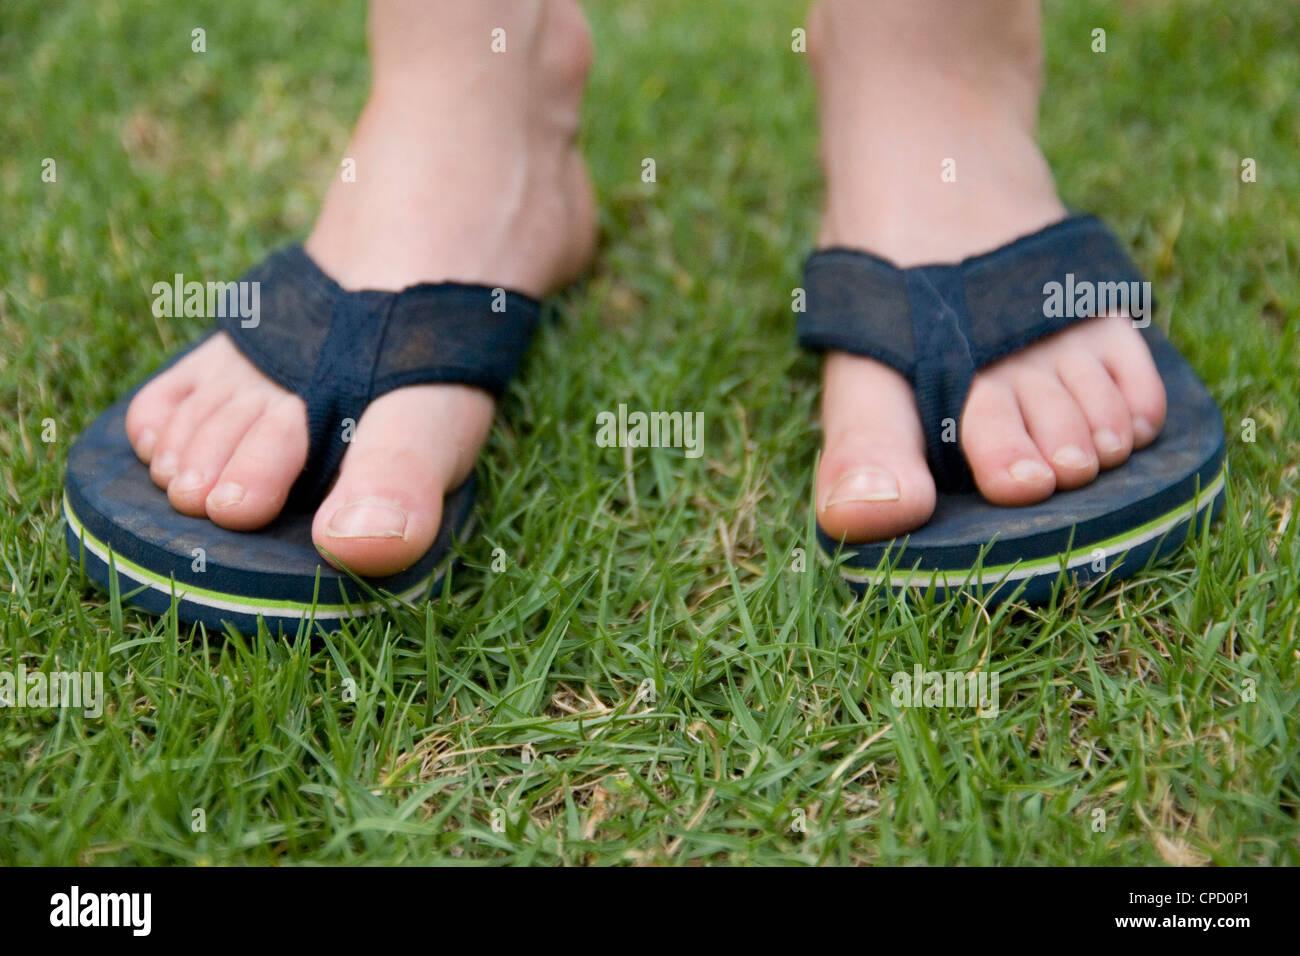 5f84340f84e16 Feet In Flip Flops Stock Photos   Feet In Flip Flops Stock Images ...